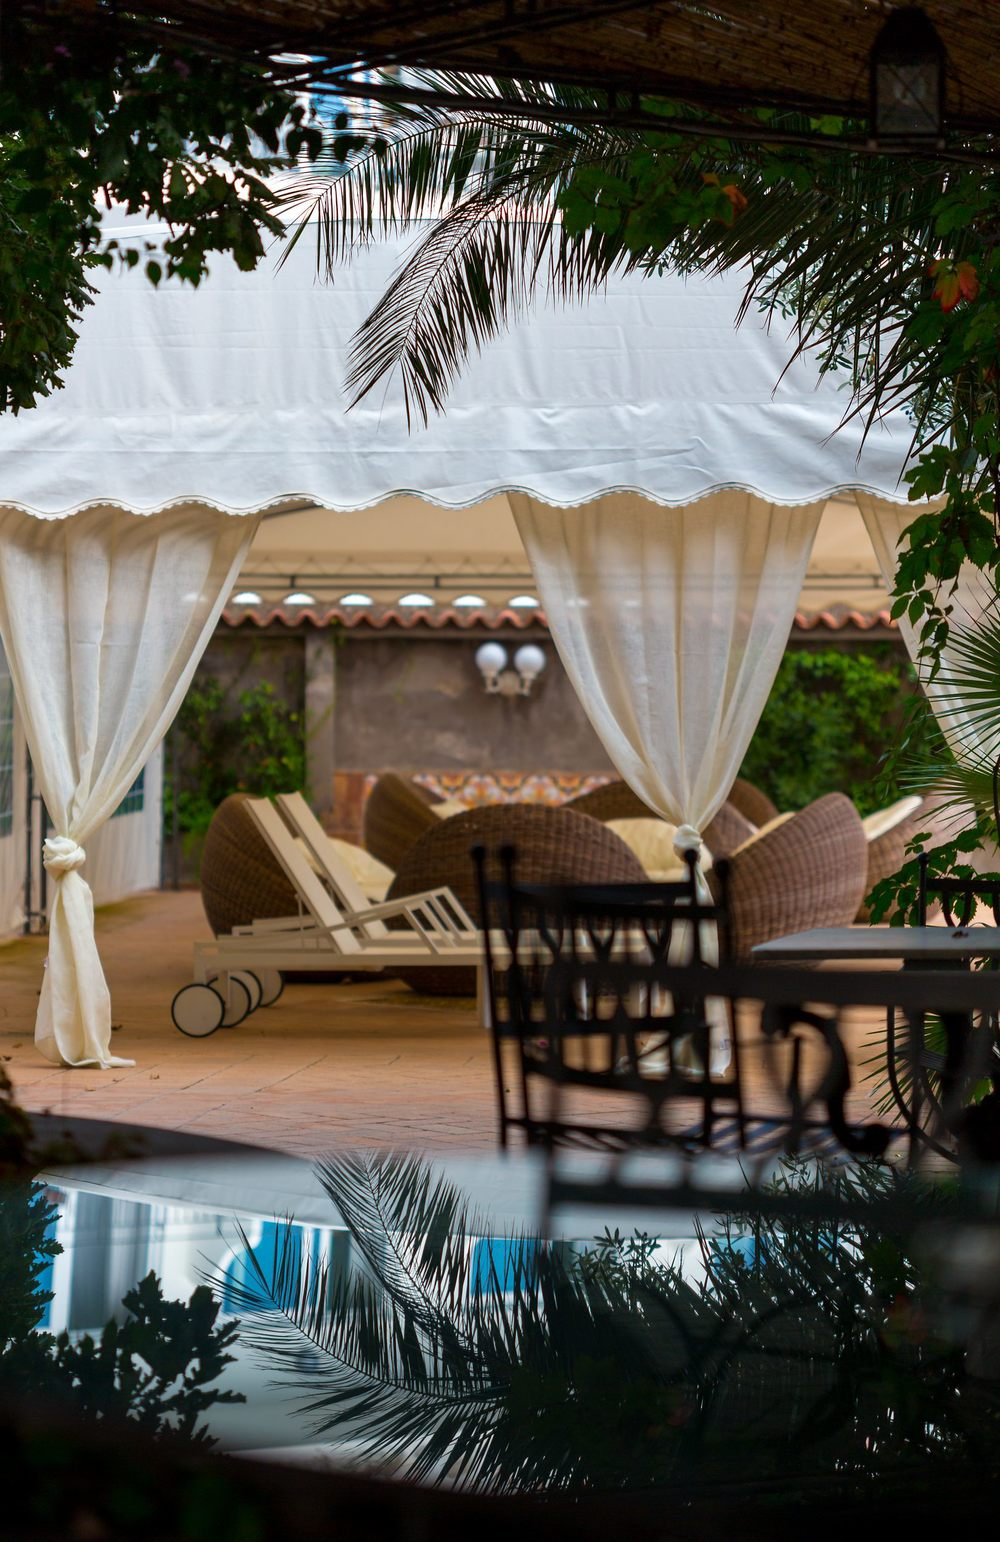 Hotel-Mamela-Capri-Italy-09.jpg